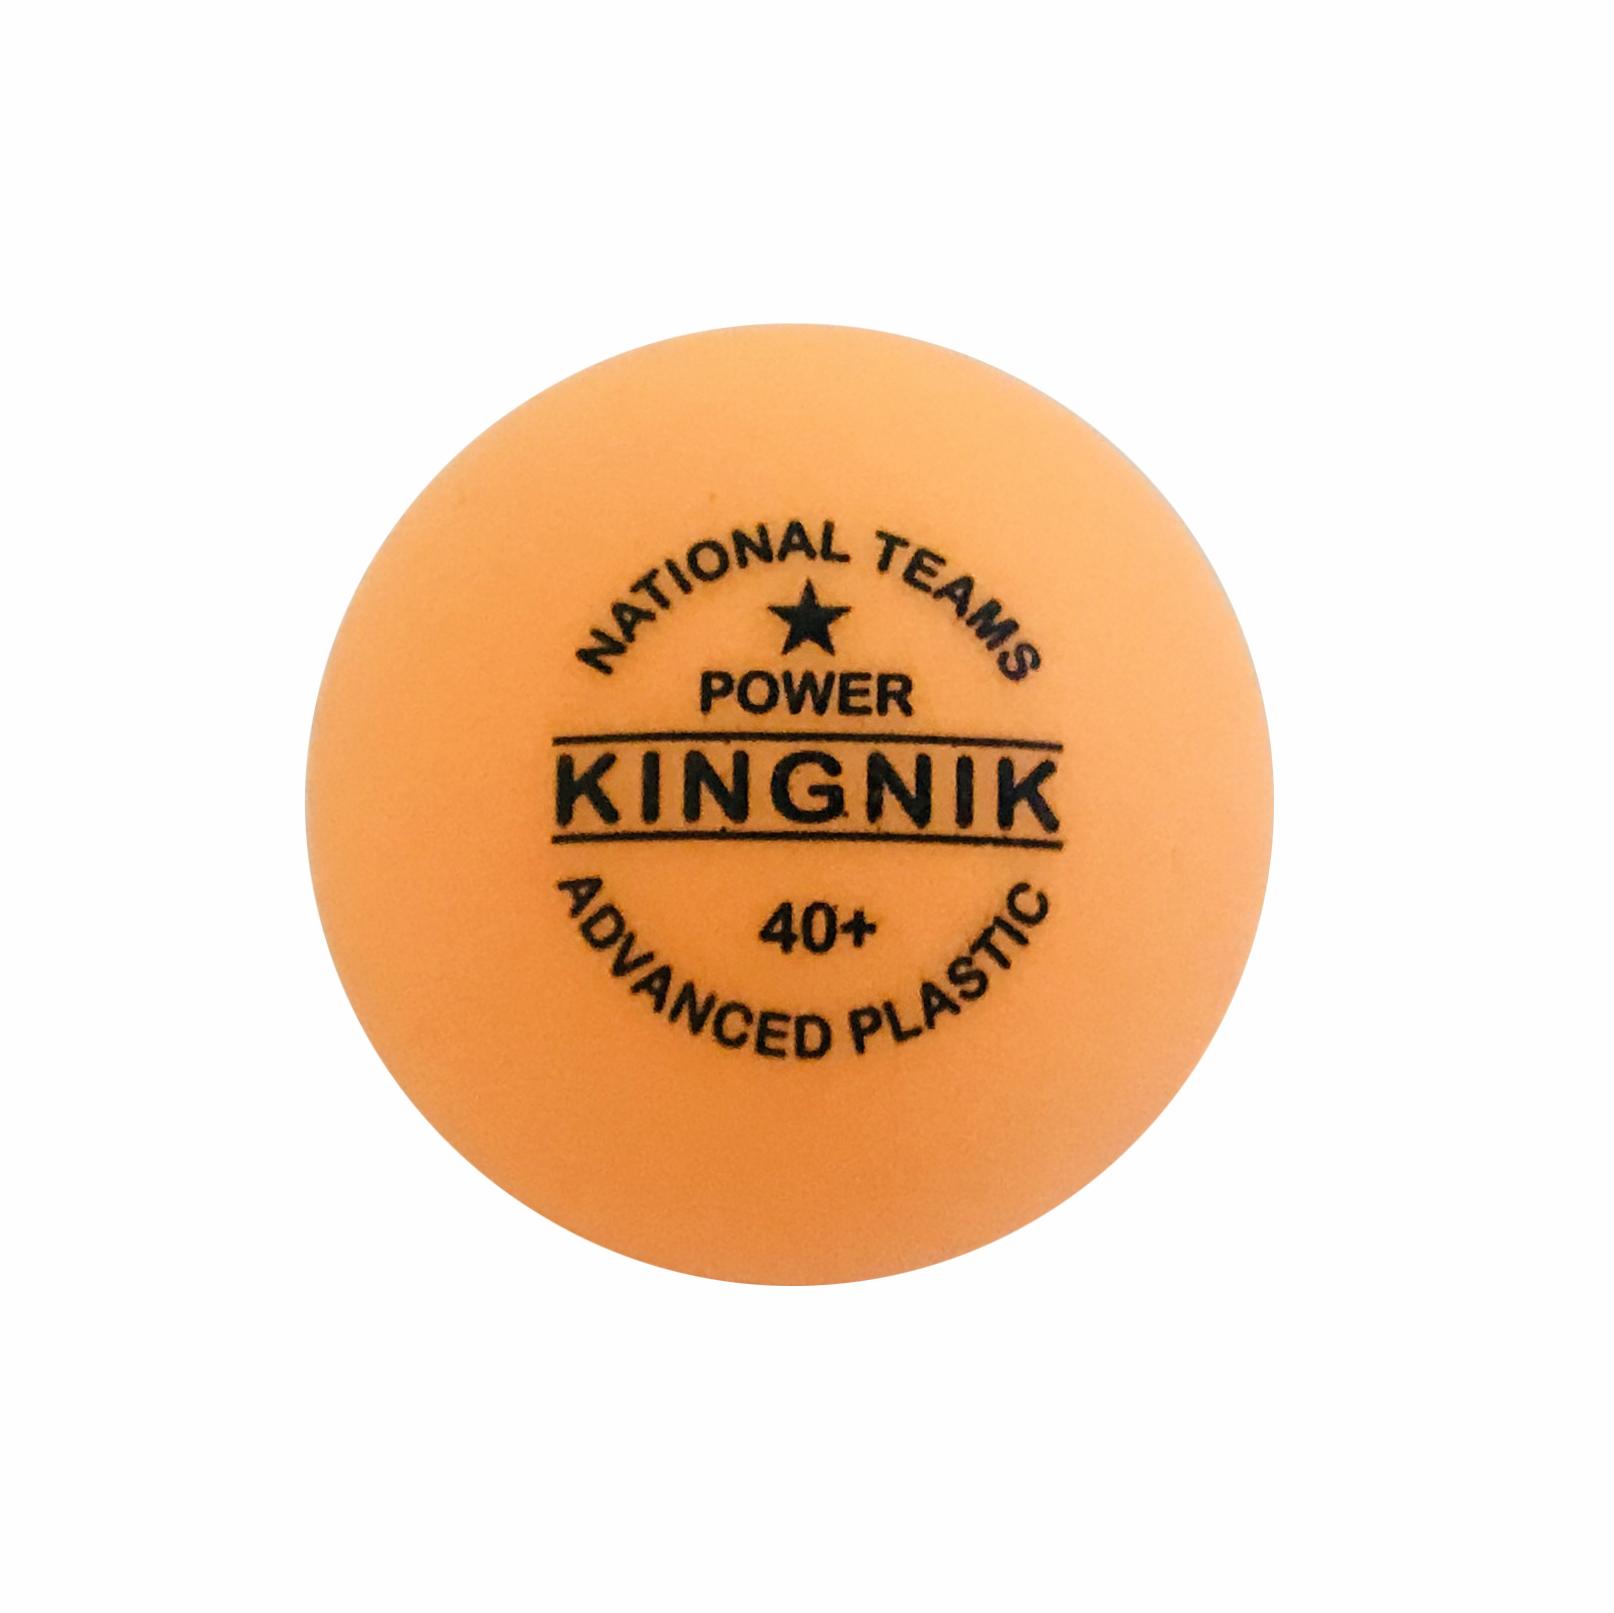 New! KINGNIK table tennis ball national teams 1 Star power 40+ plastic white (customized logo)